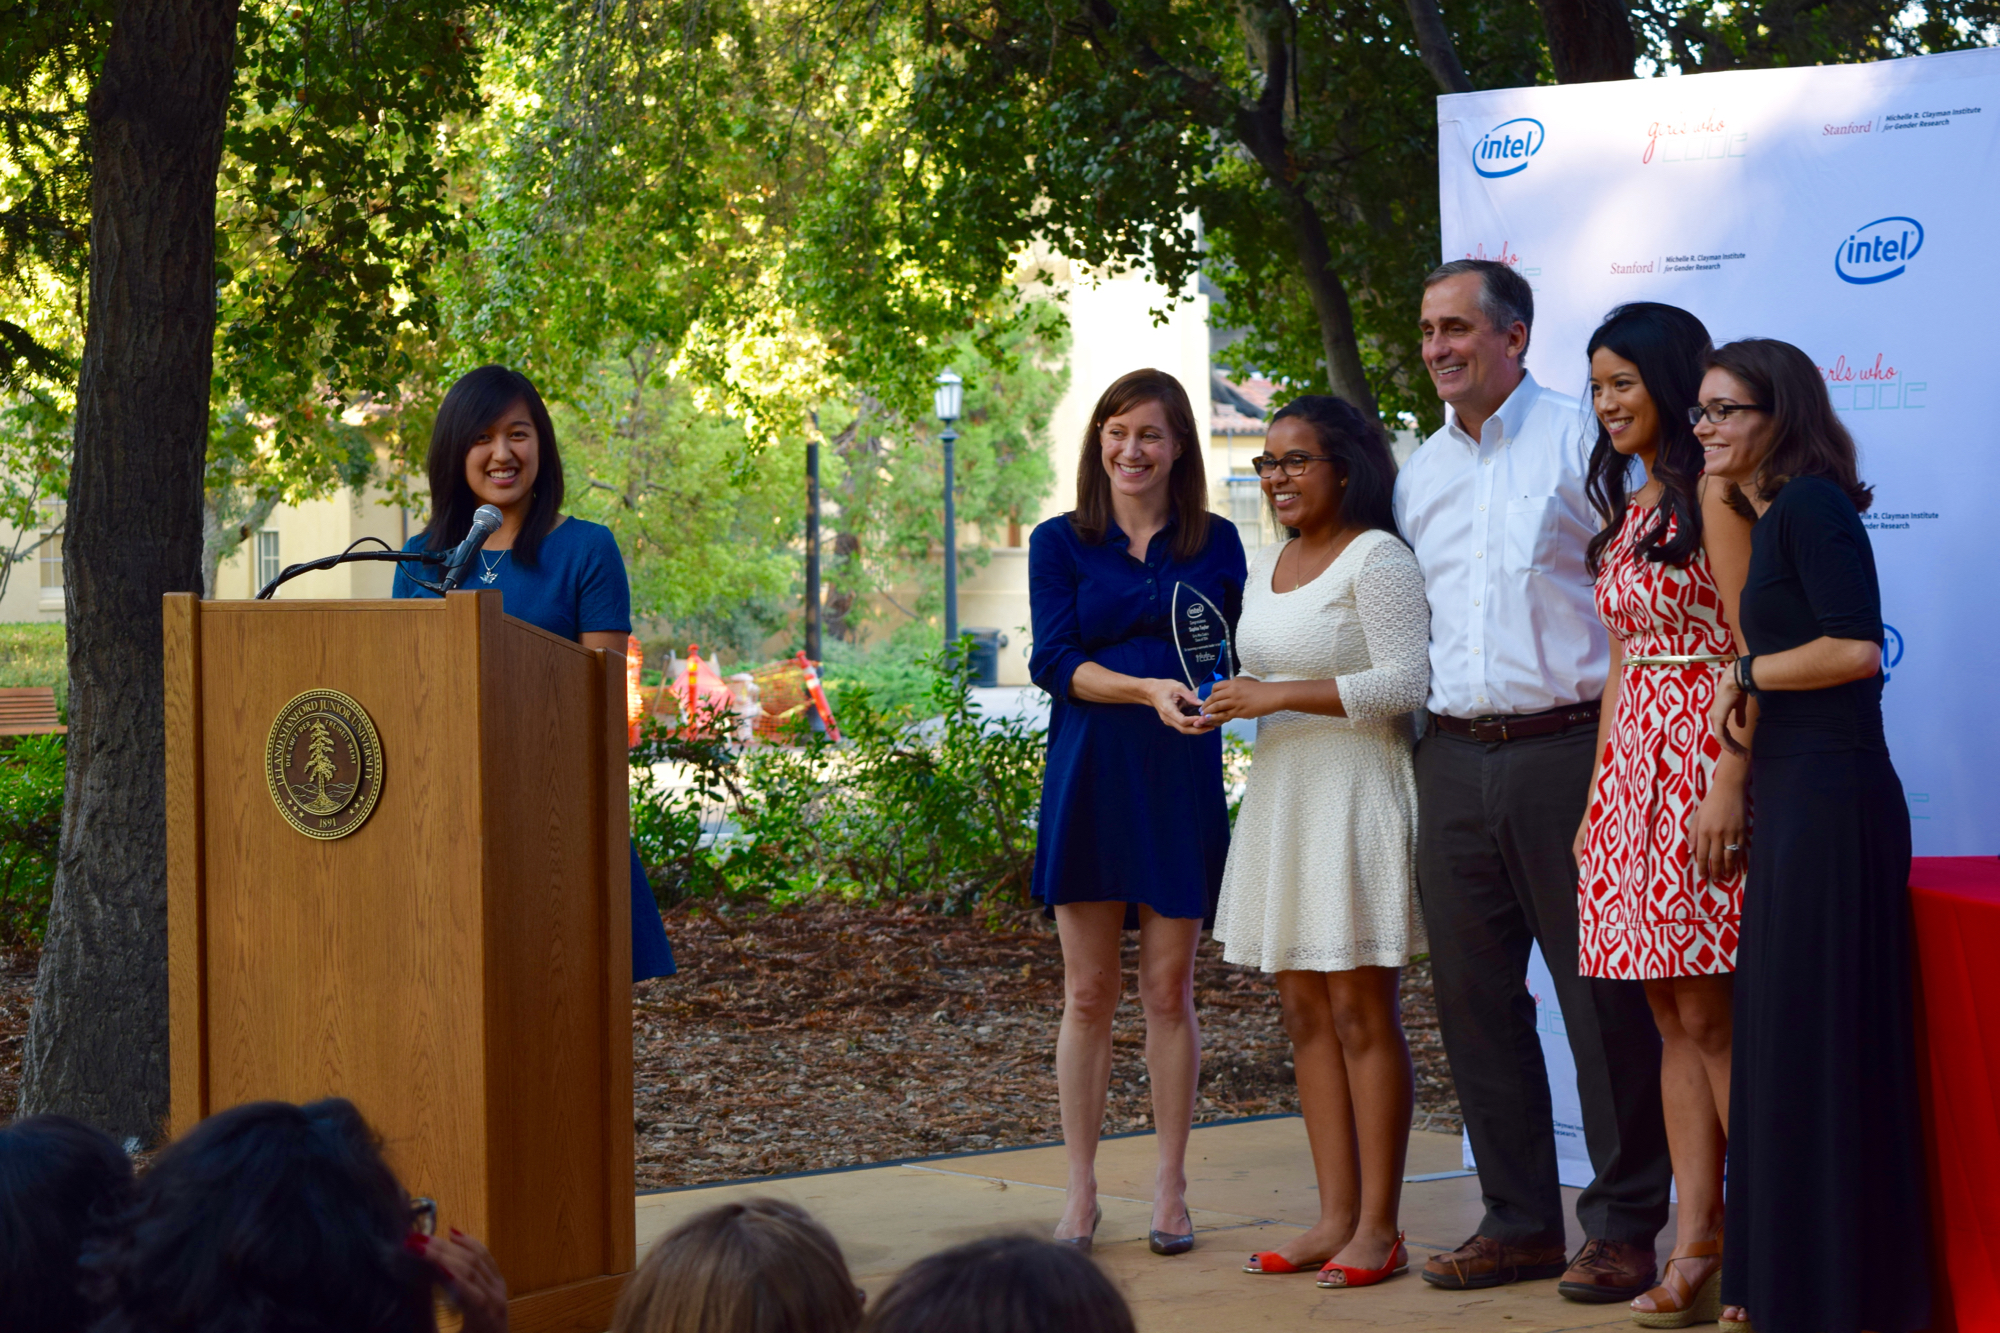 Girls Who Code Graduation @ Stanford with Intel's CEO Brian Krzanich